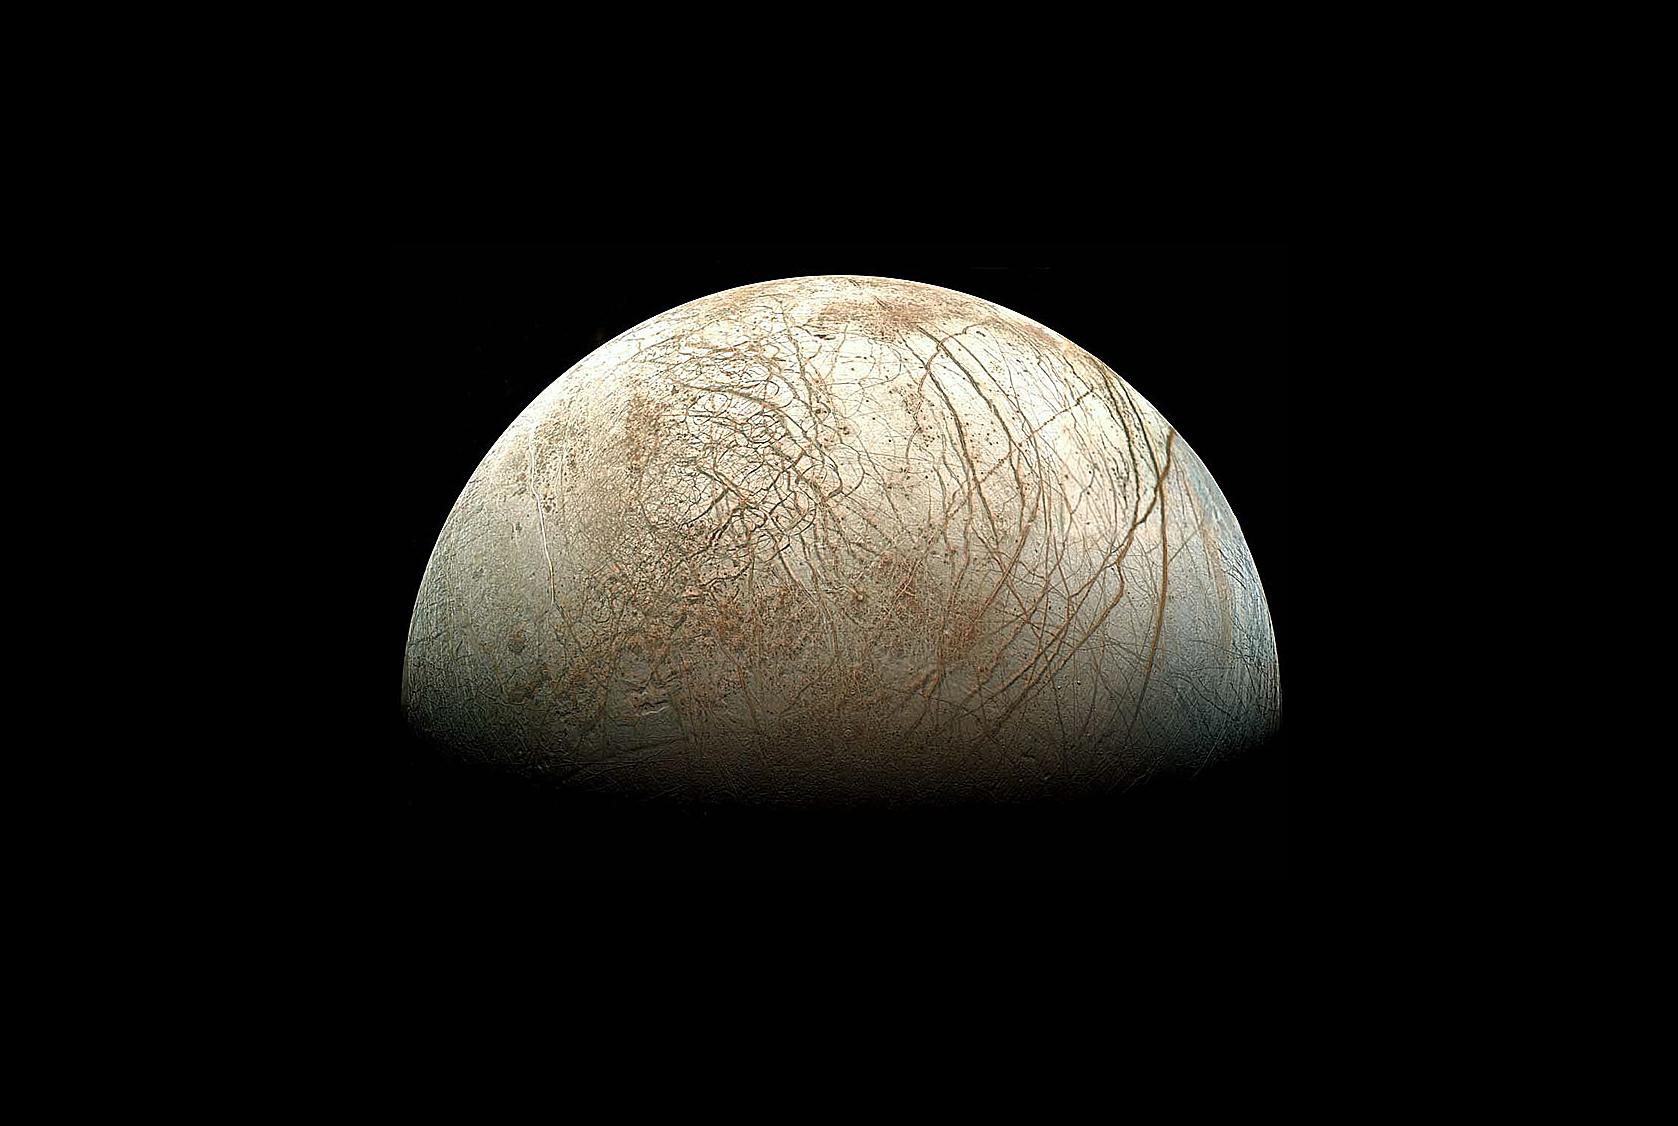 europa moon facts - HD1678×1126